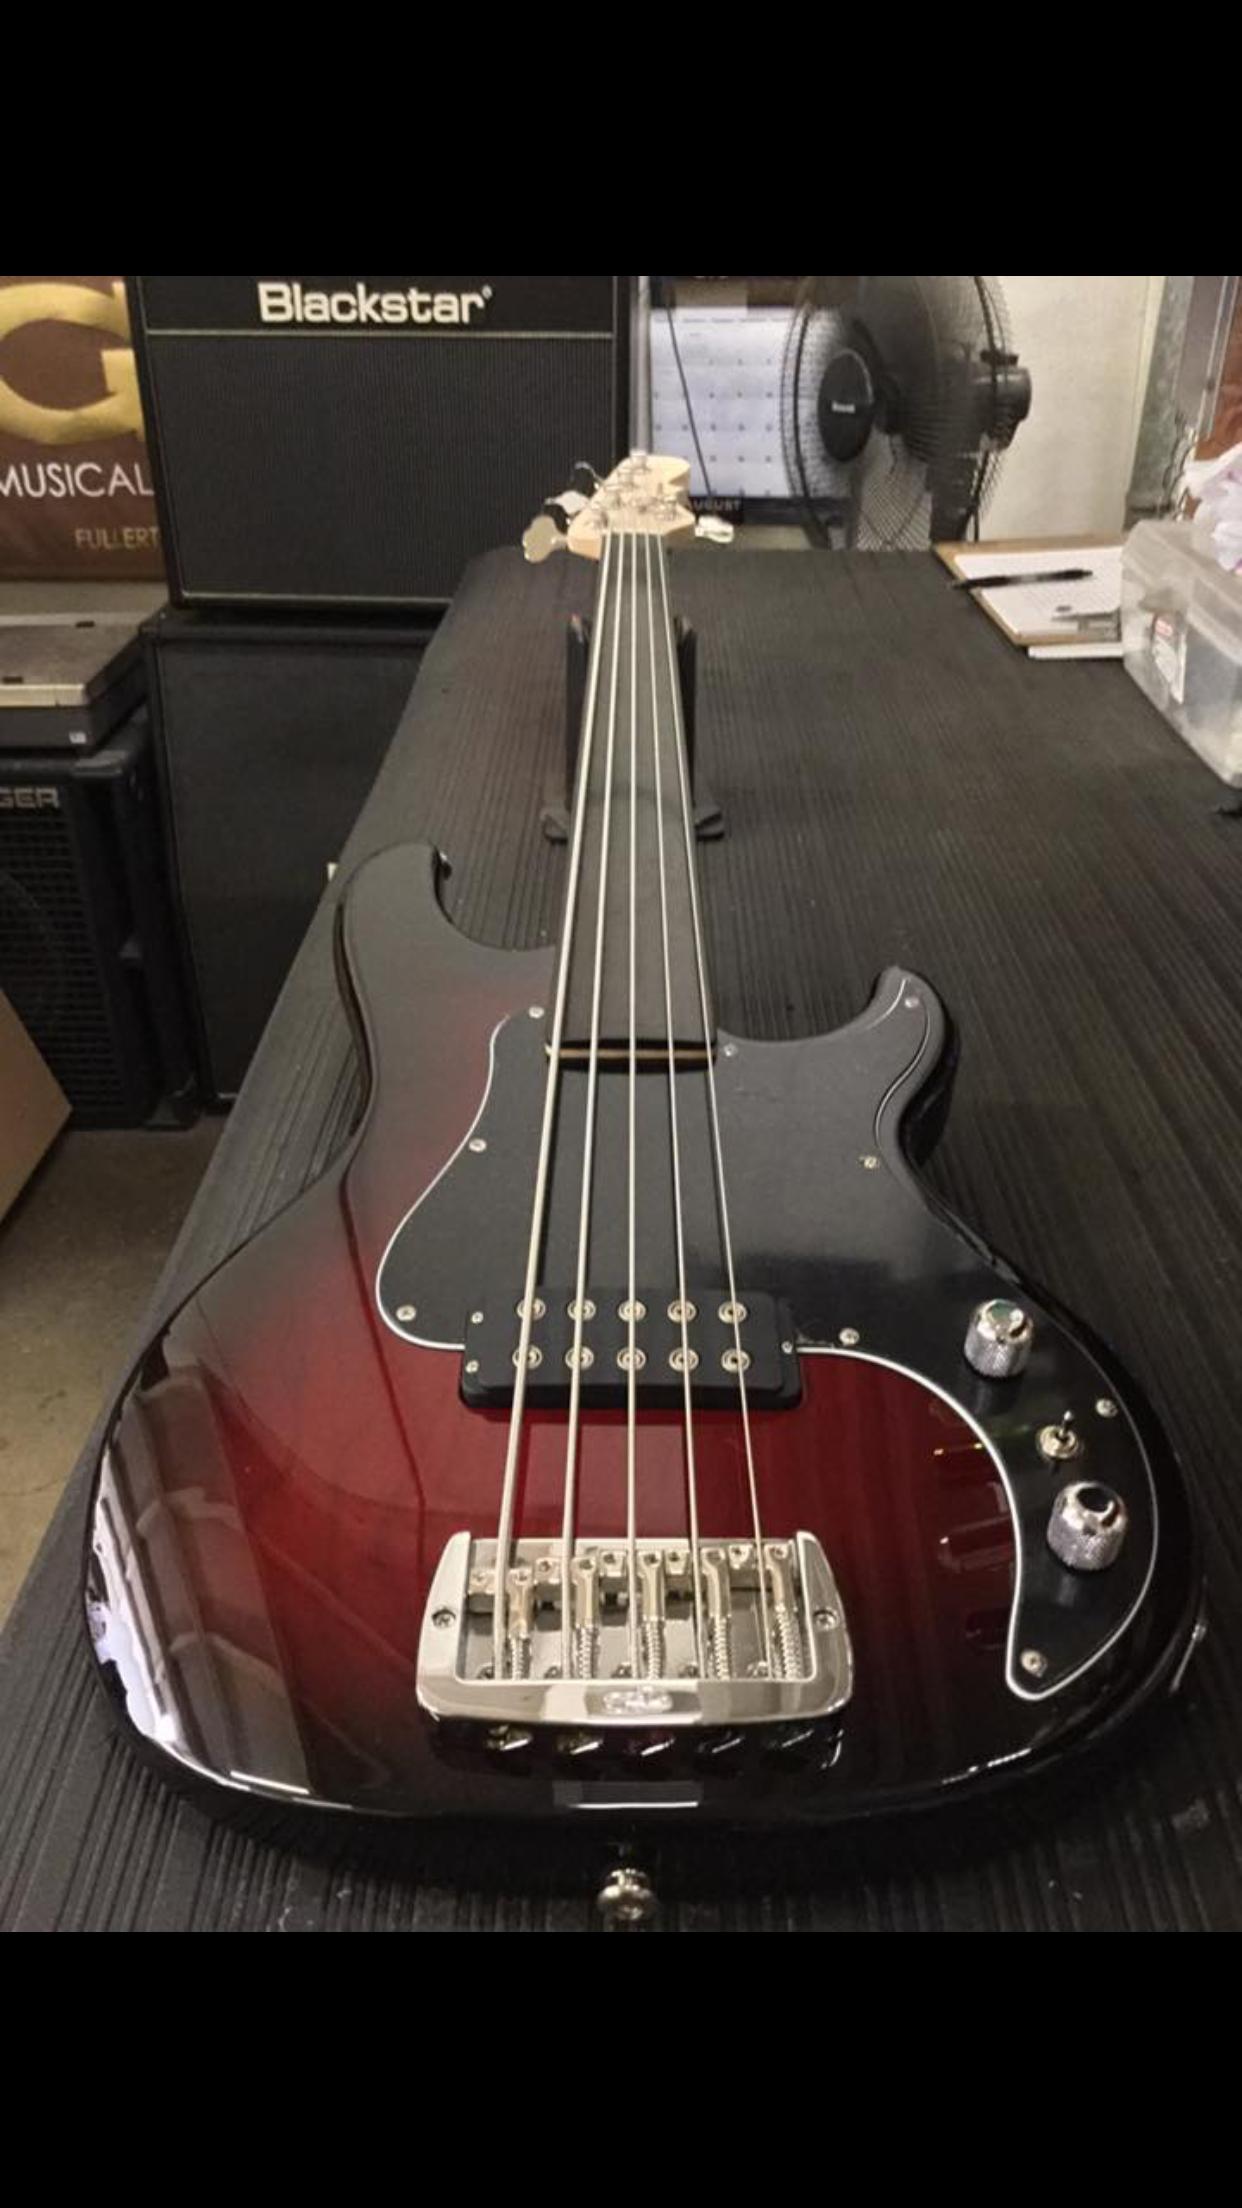 g l kiloton fretless 5 bass guitar in 2019 bass ukulele music chords guitar chords. Black Bedroom Furniture Sets. Home Design Ideas